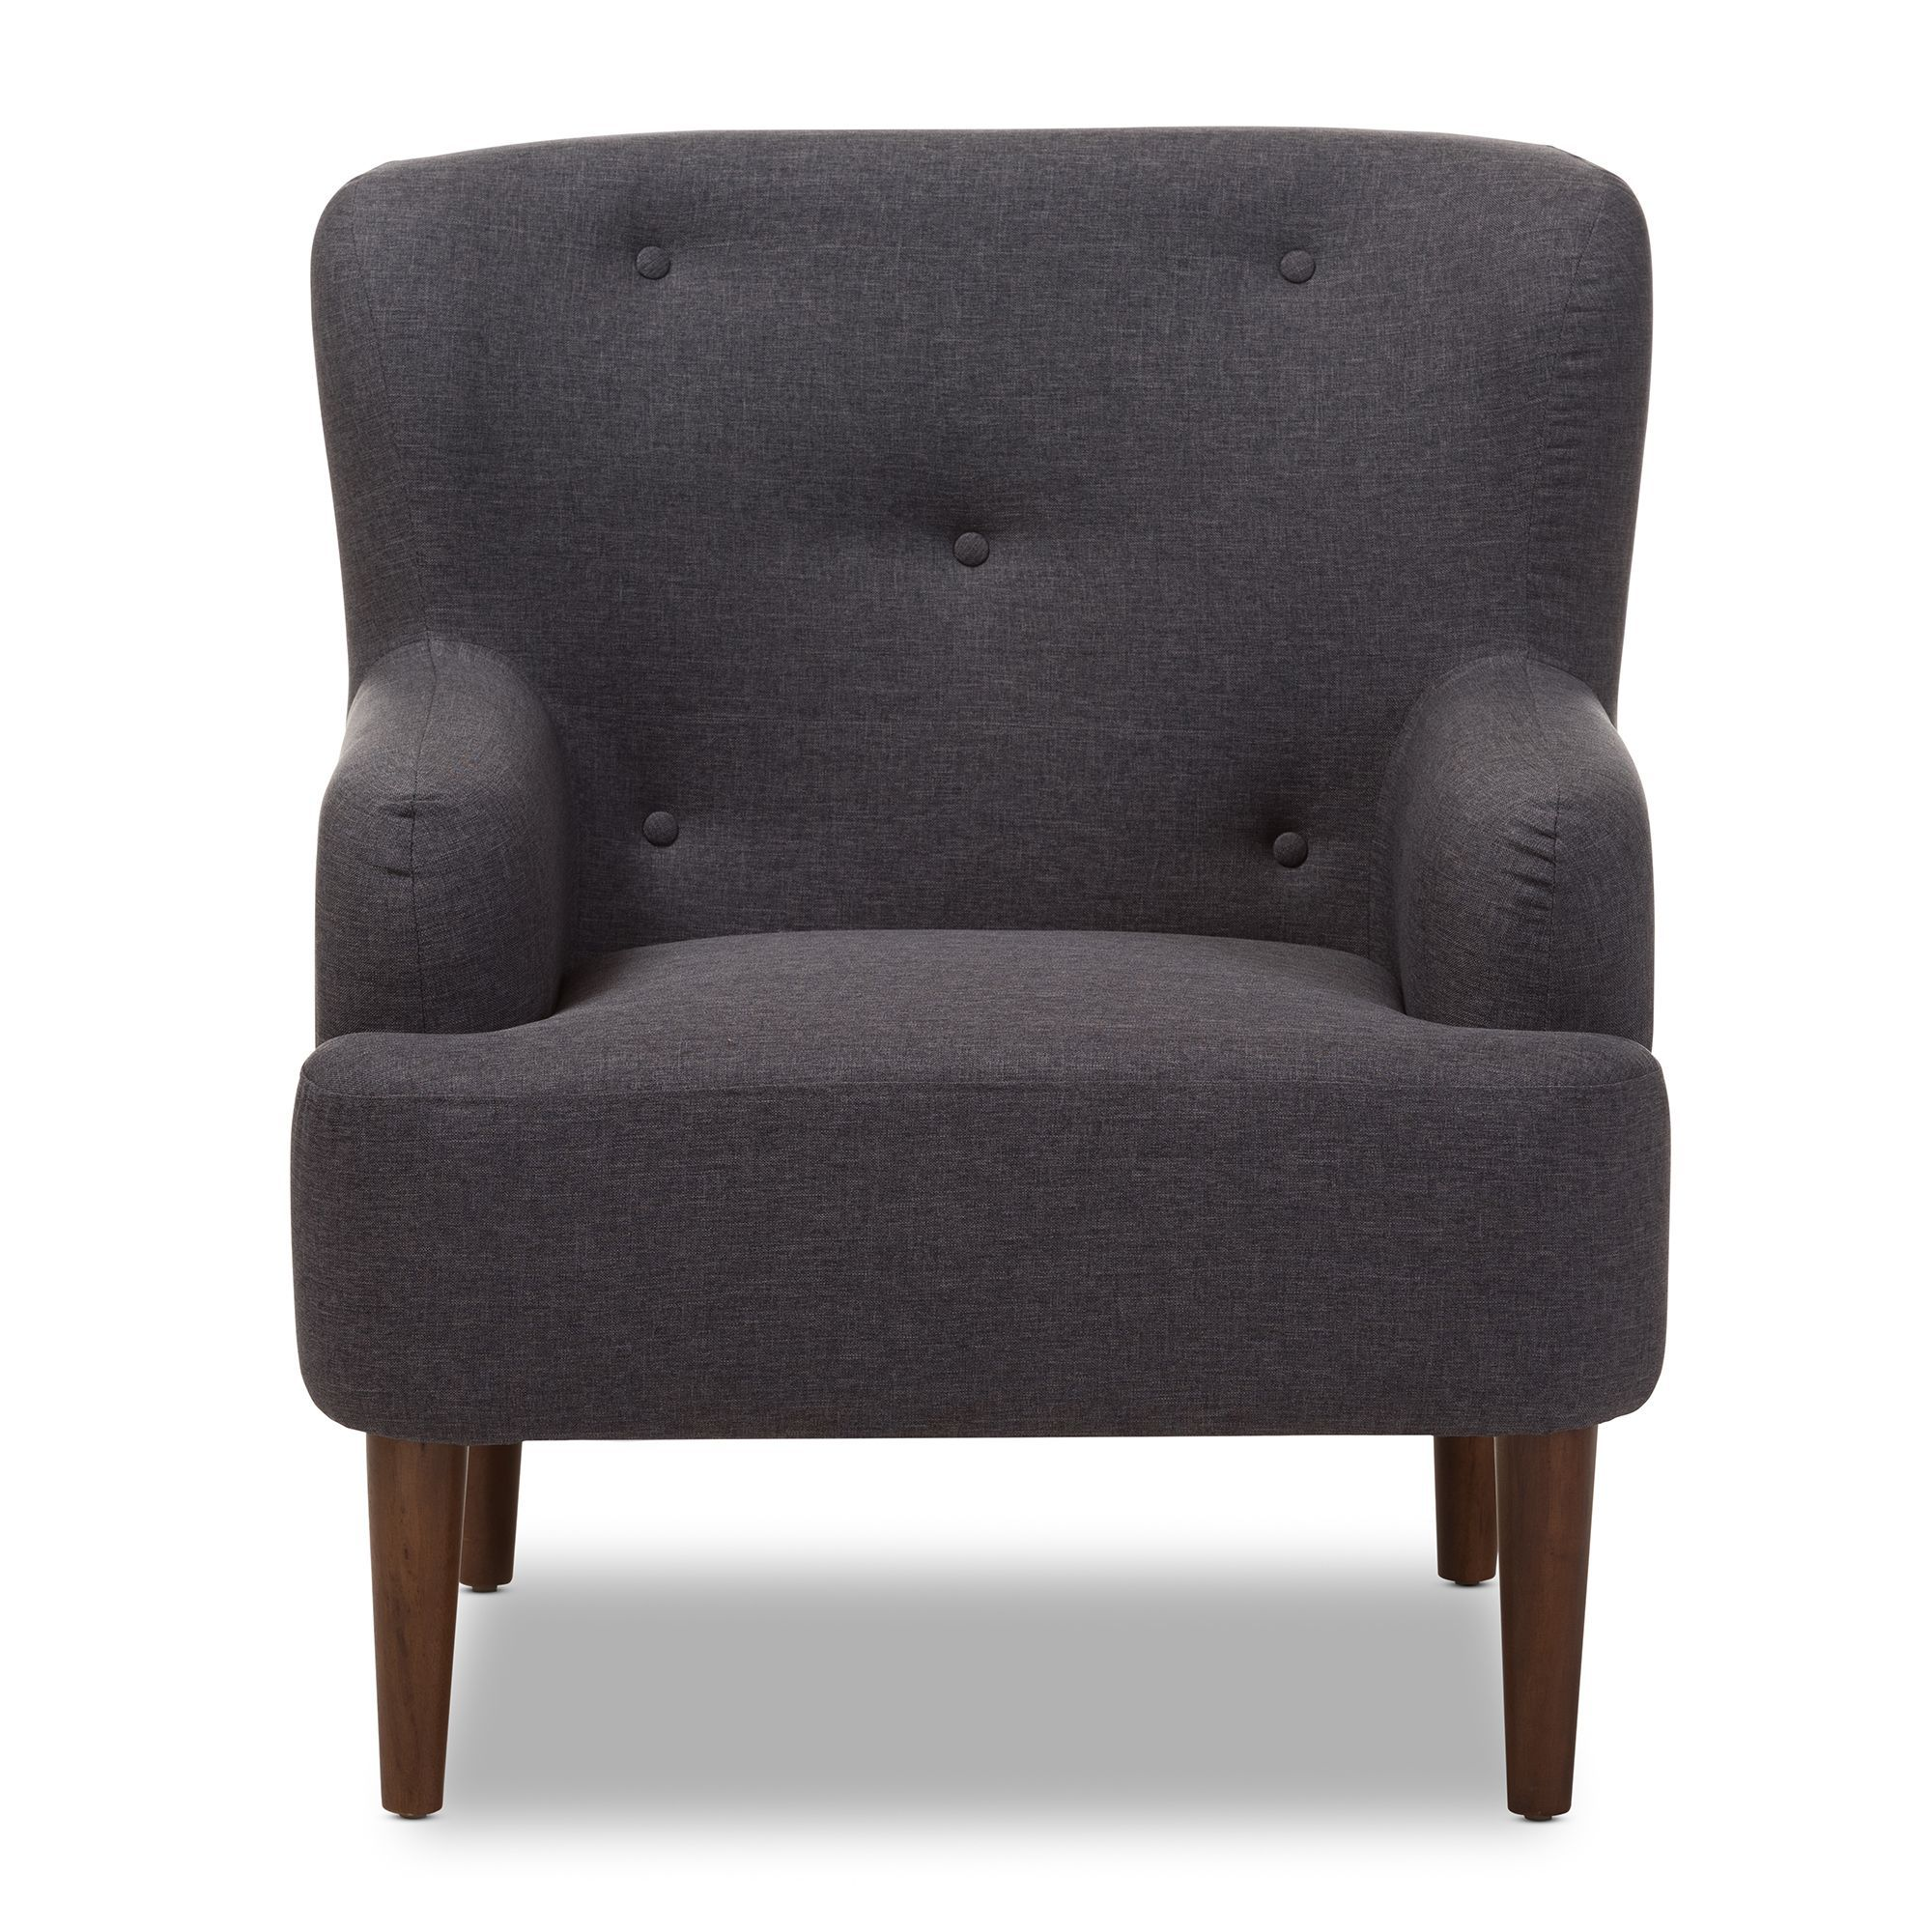 Baxton Studio Dimitrios Mid-Century Modern Upholstered Walnut Wood Button-Tufted Armchair